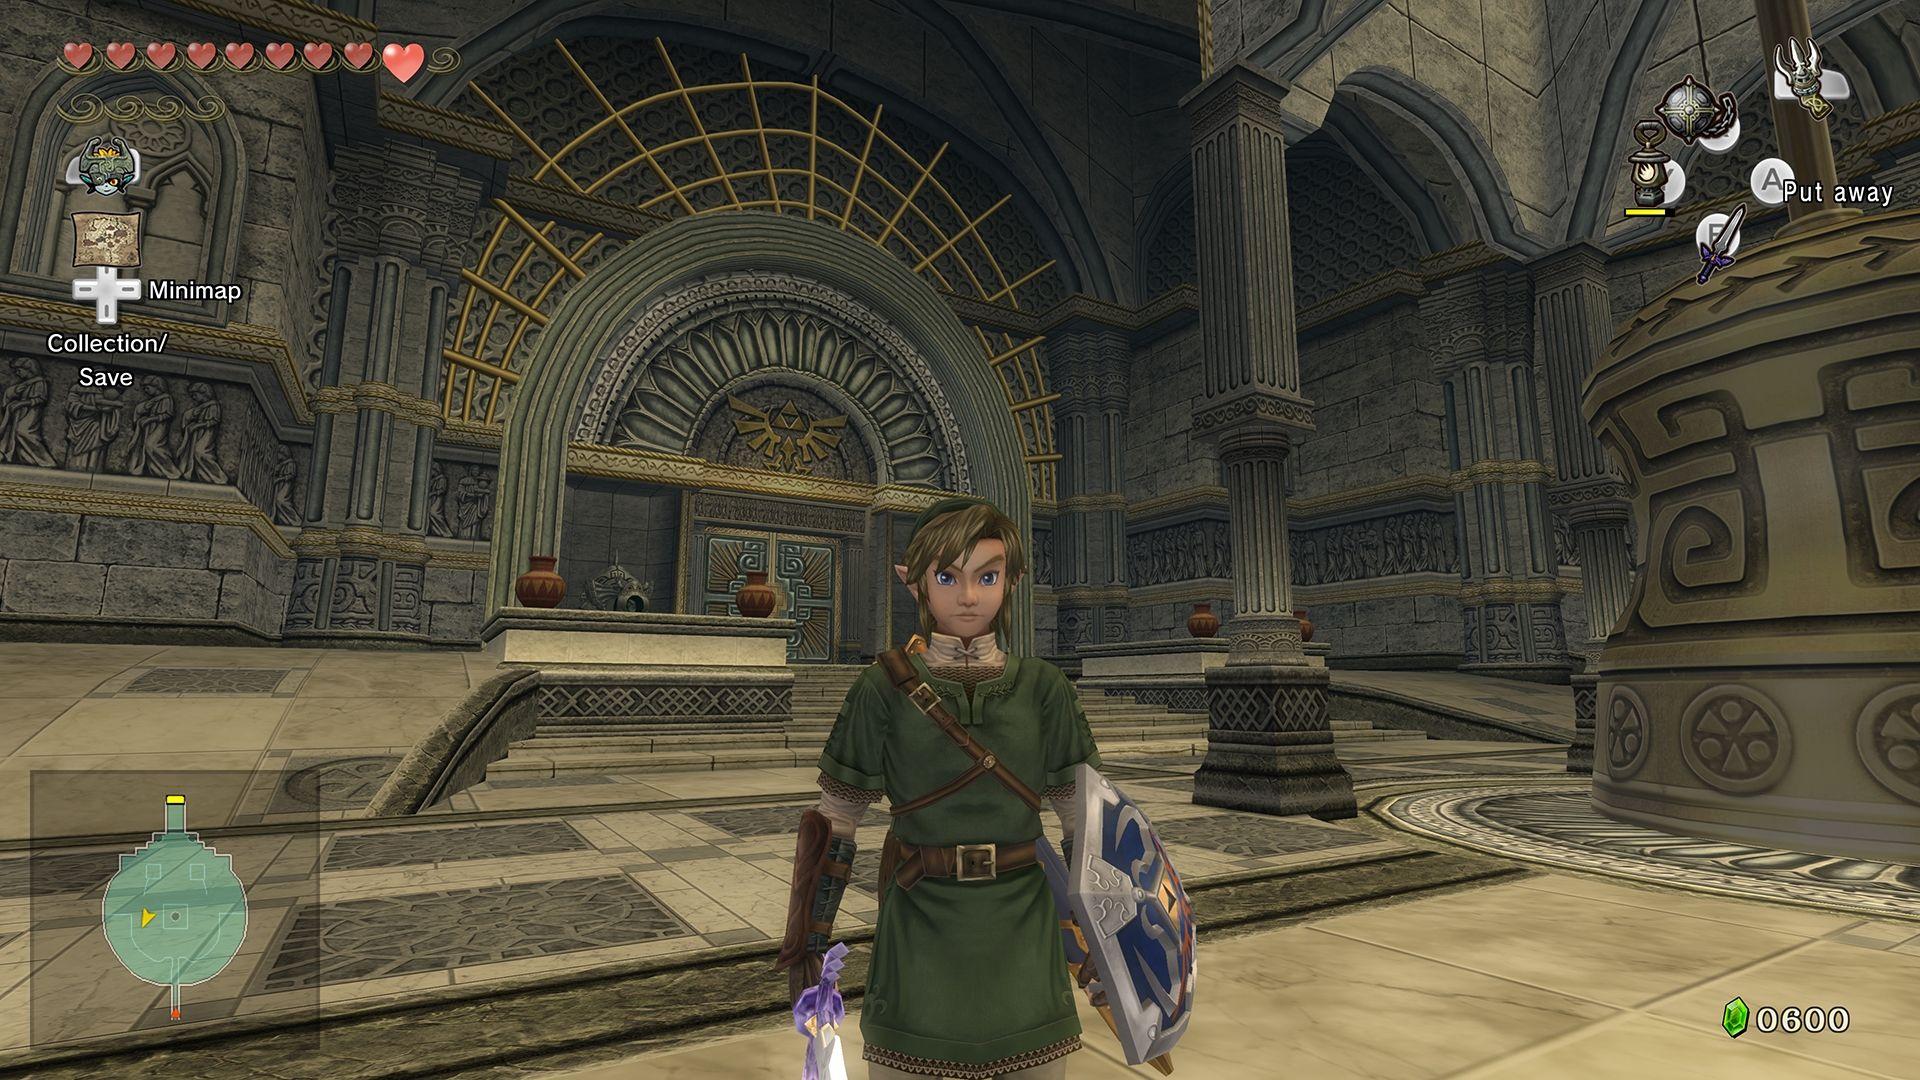 Twilight Princess Wii U